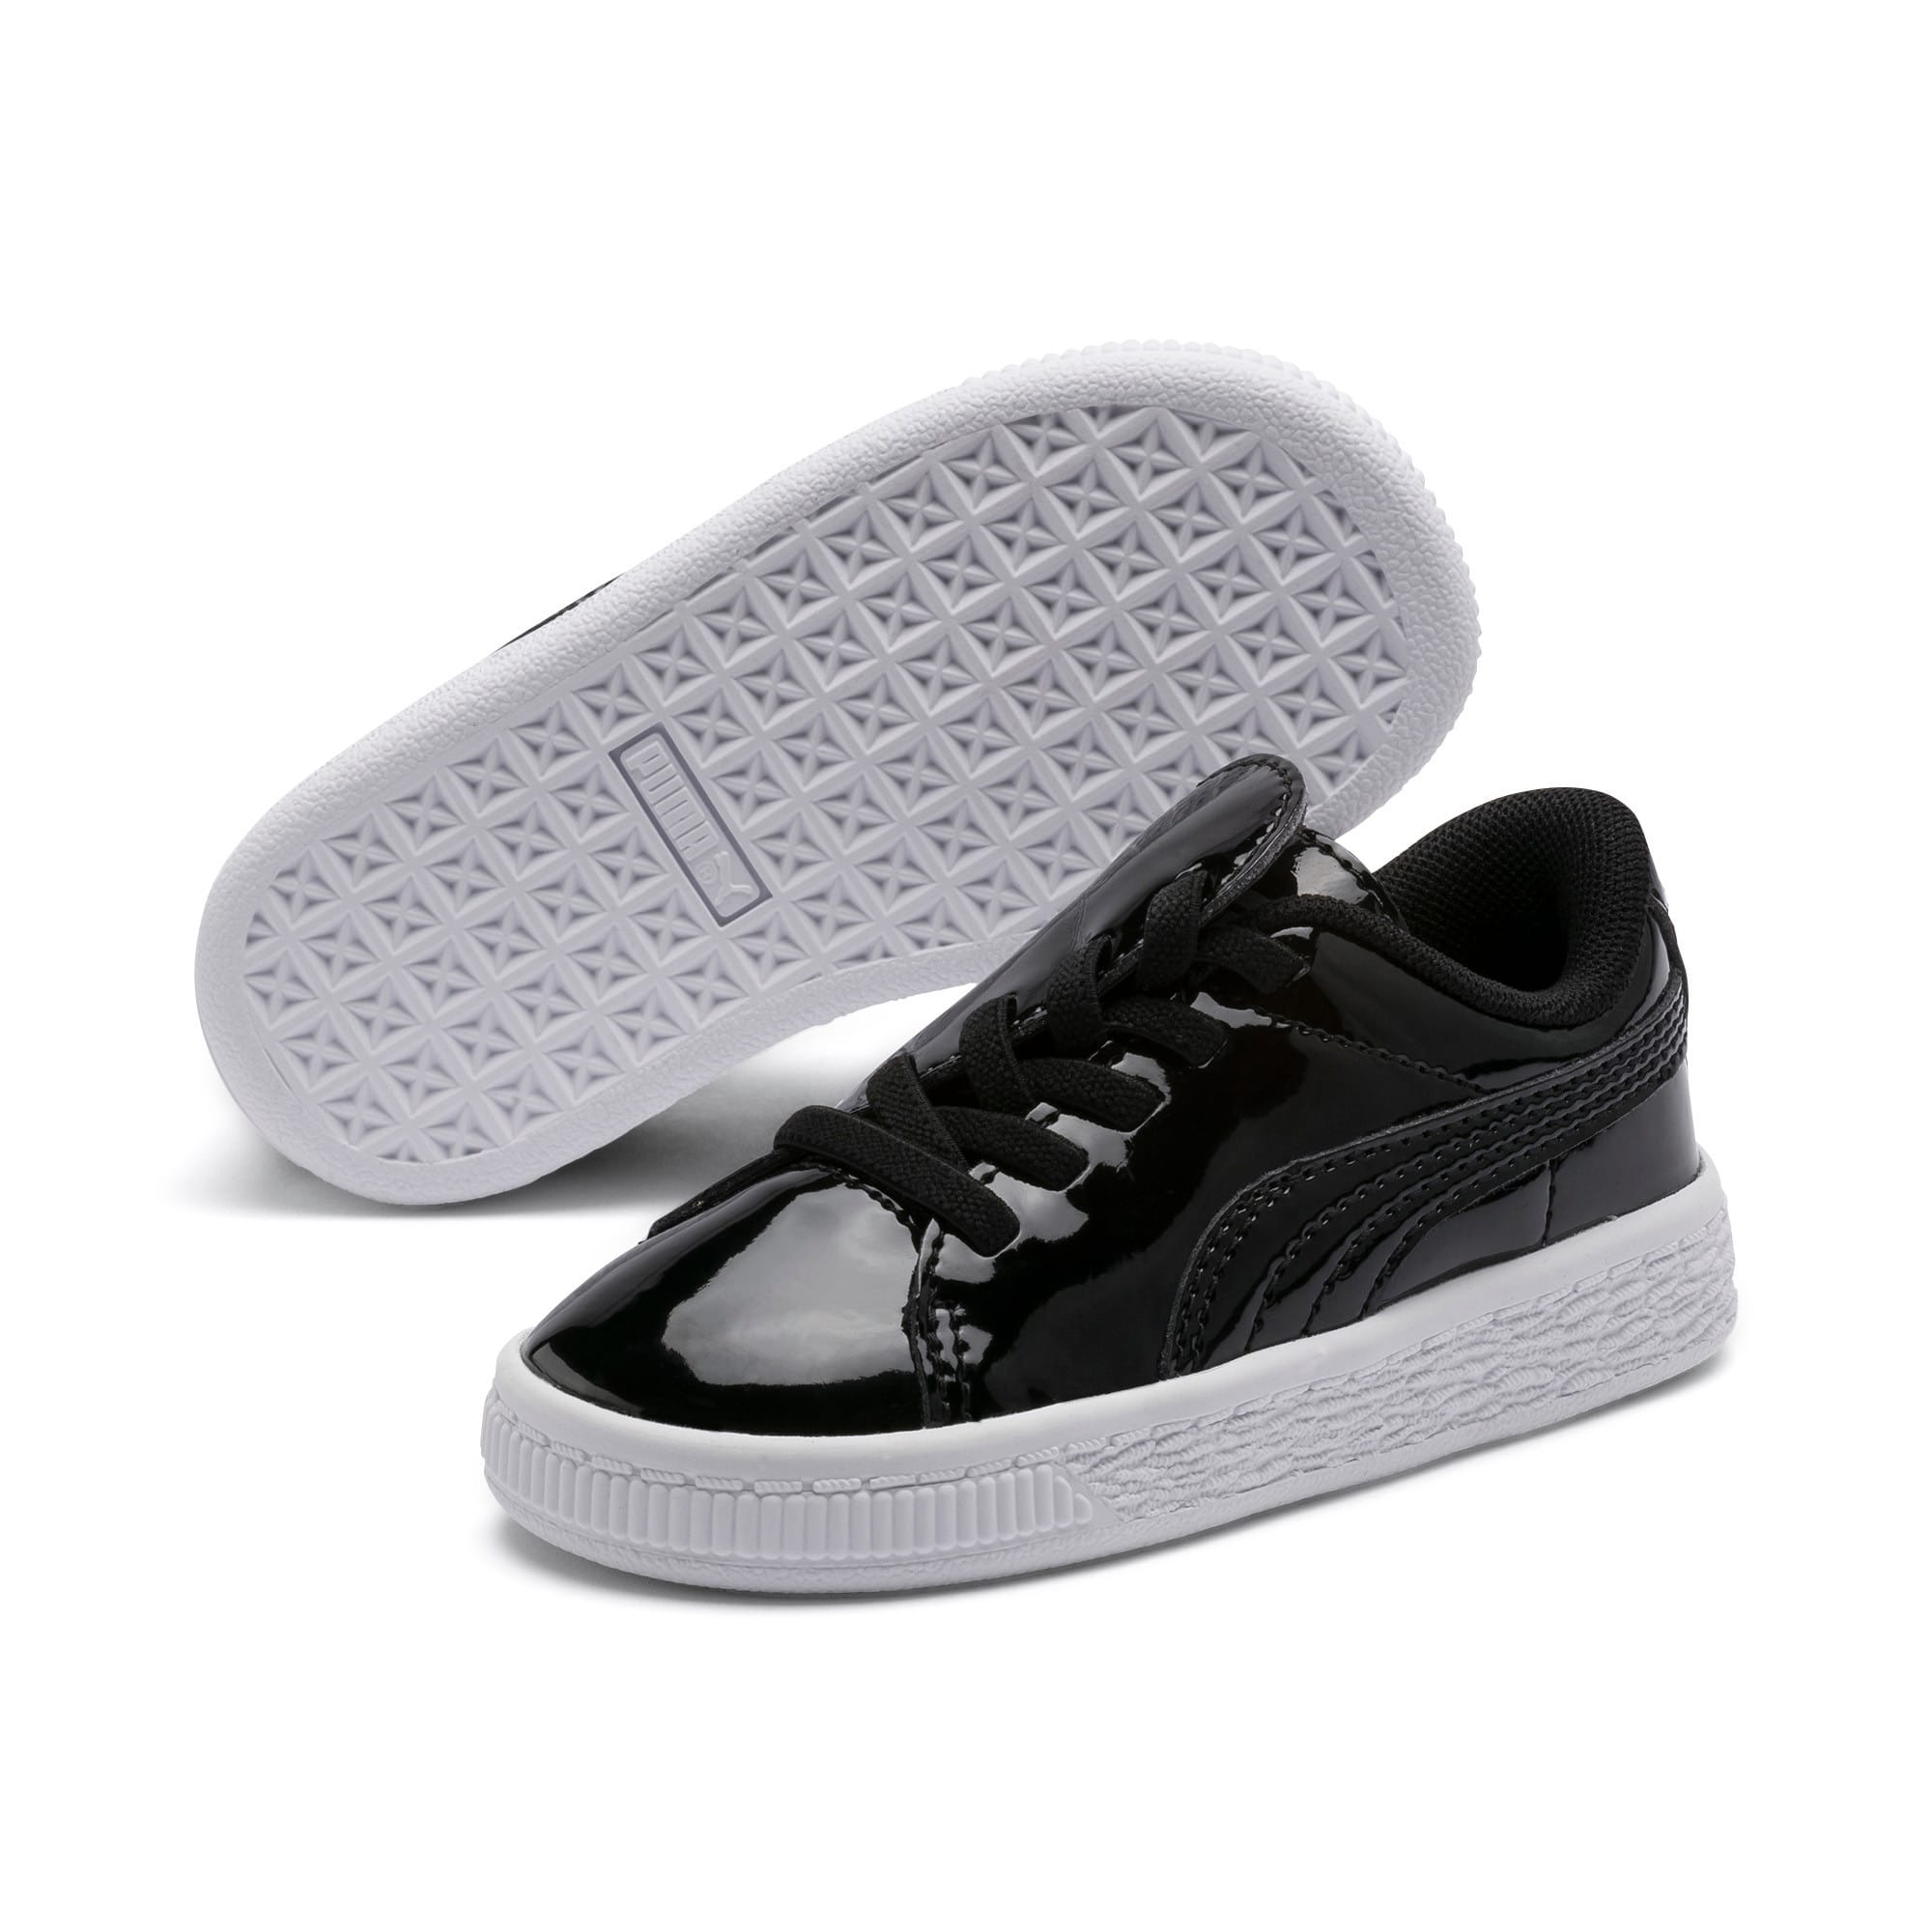 Thumbnail 1 of Basket Crush Patent AC Toddler Shoes, Puma Black-Puma White, medium